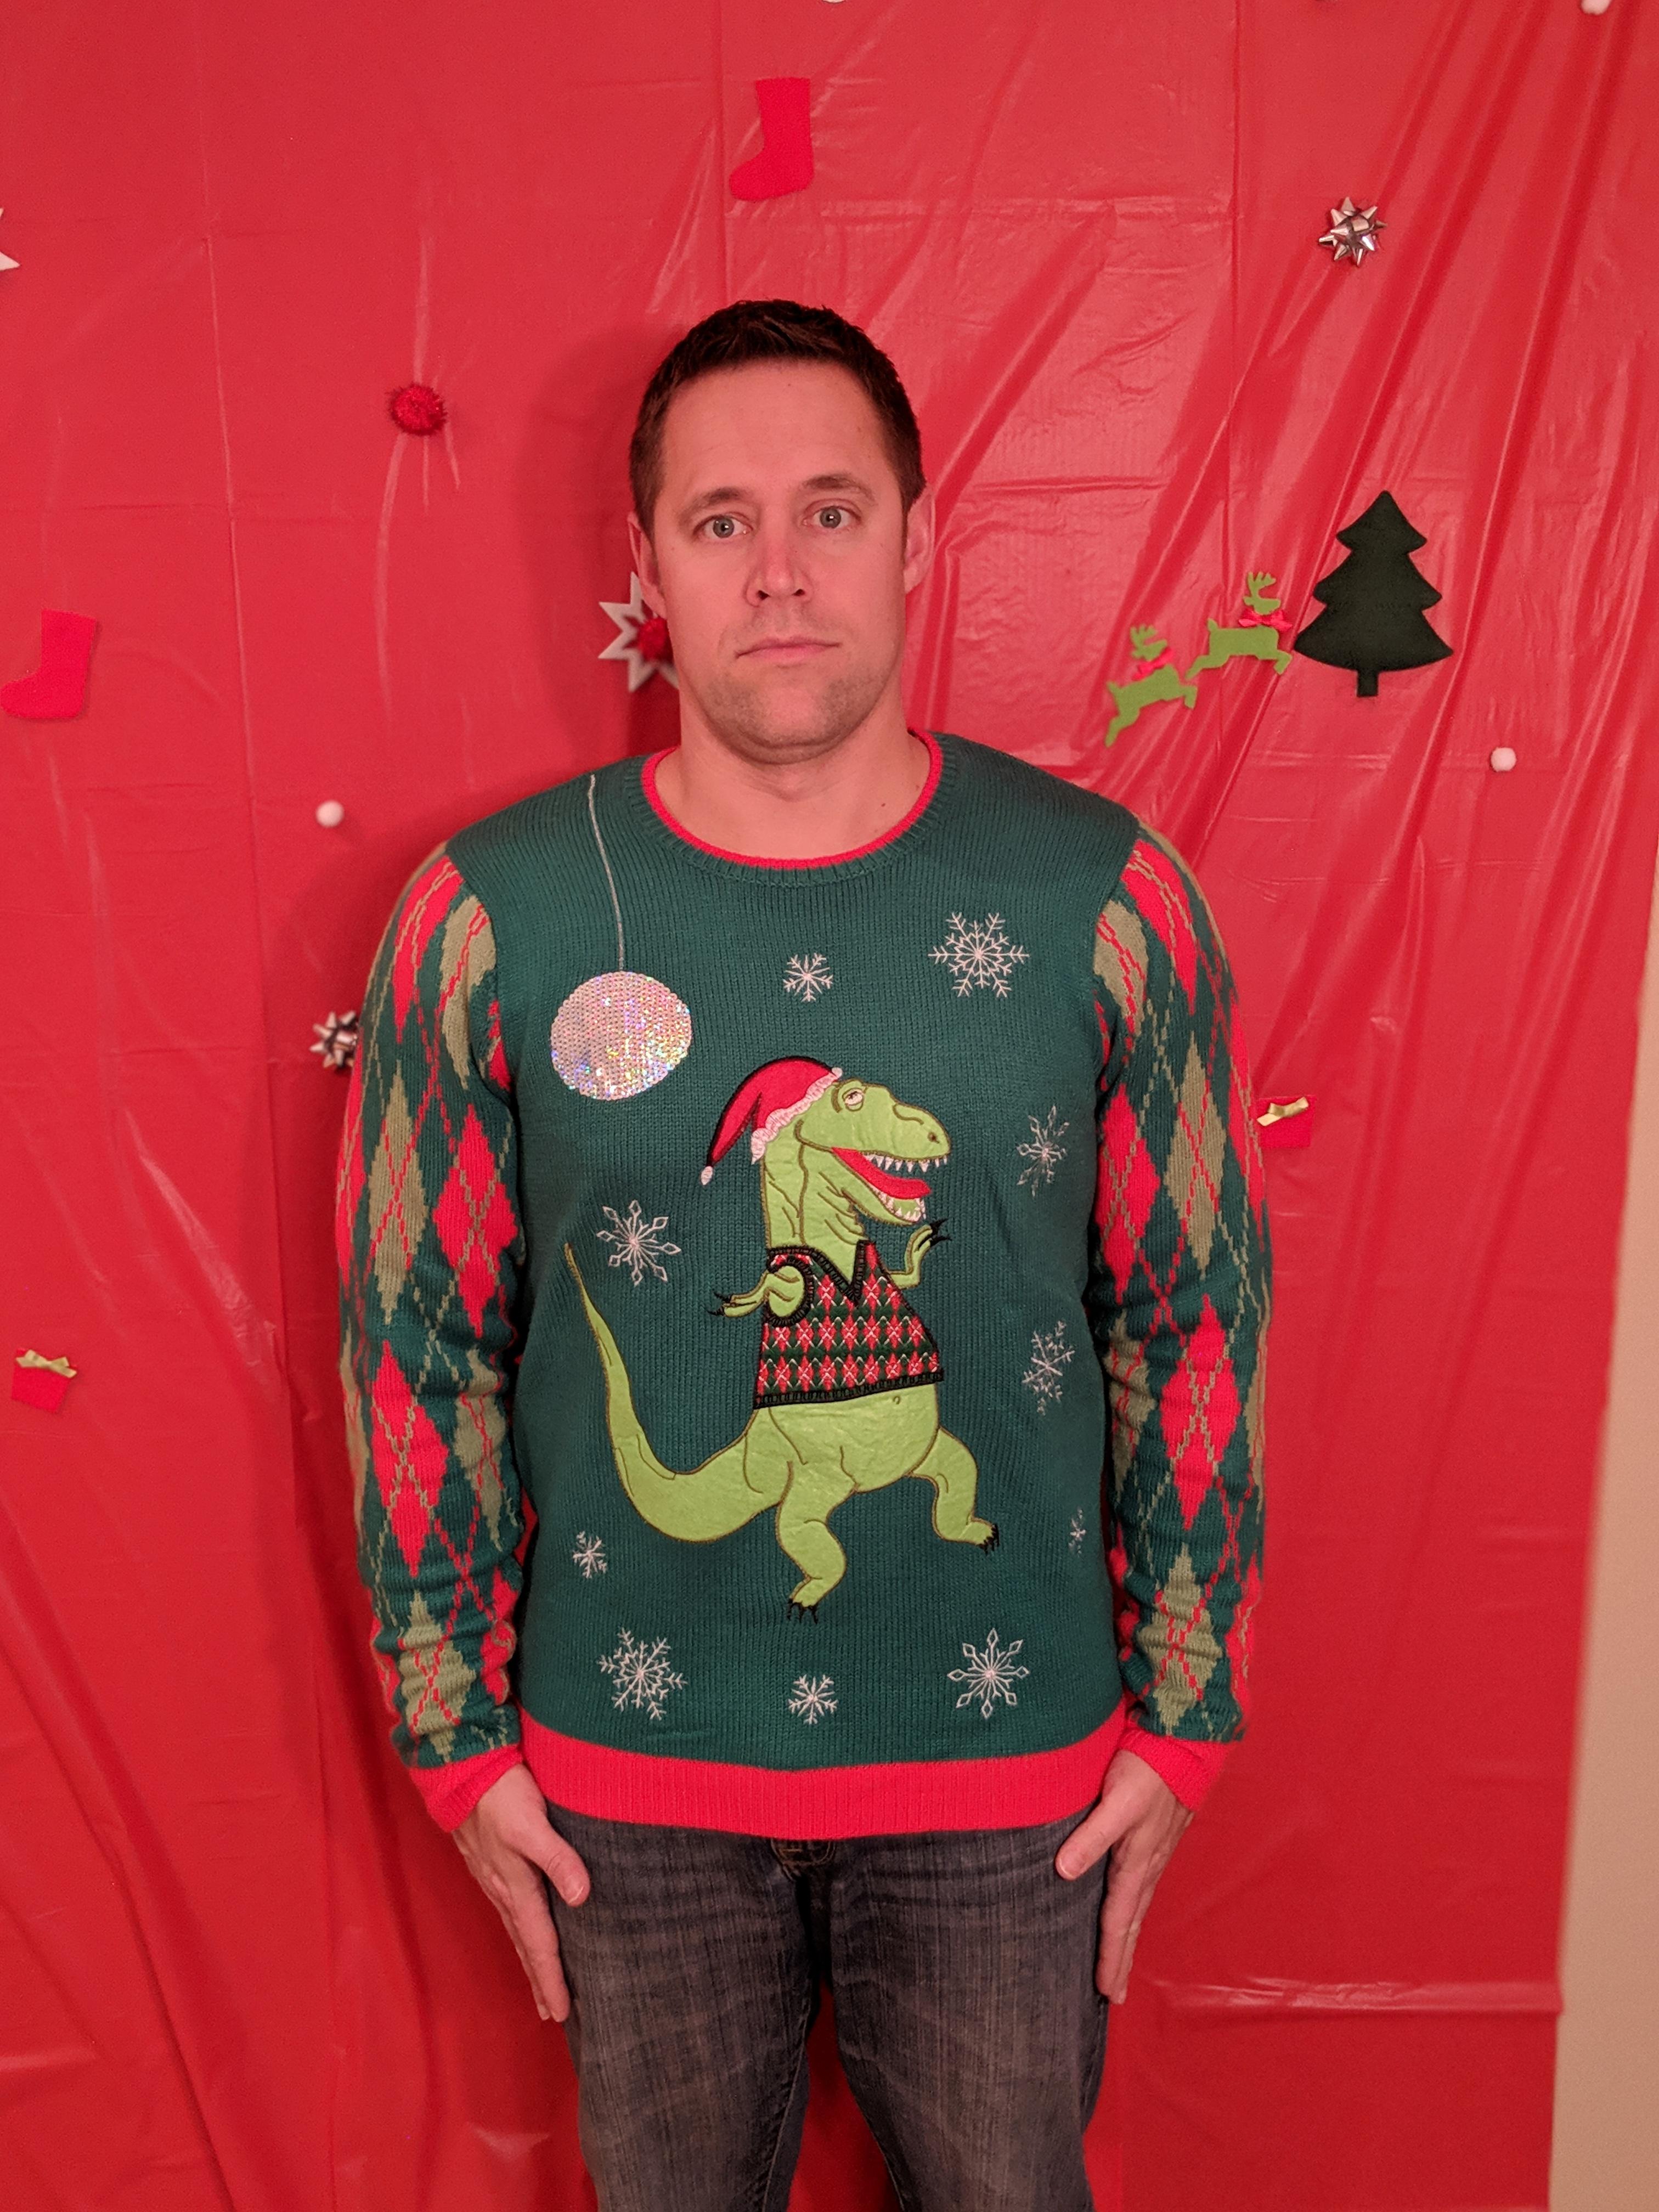 2018 Ugly Sweater Ryan